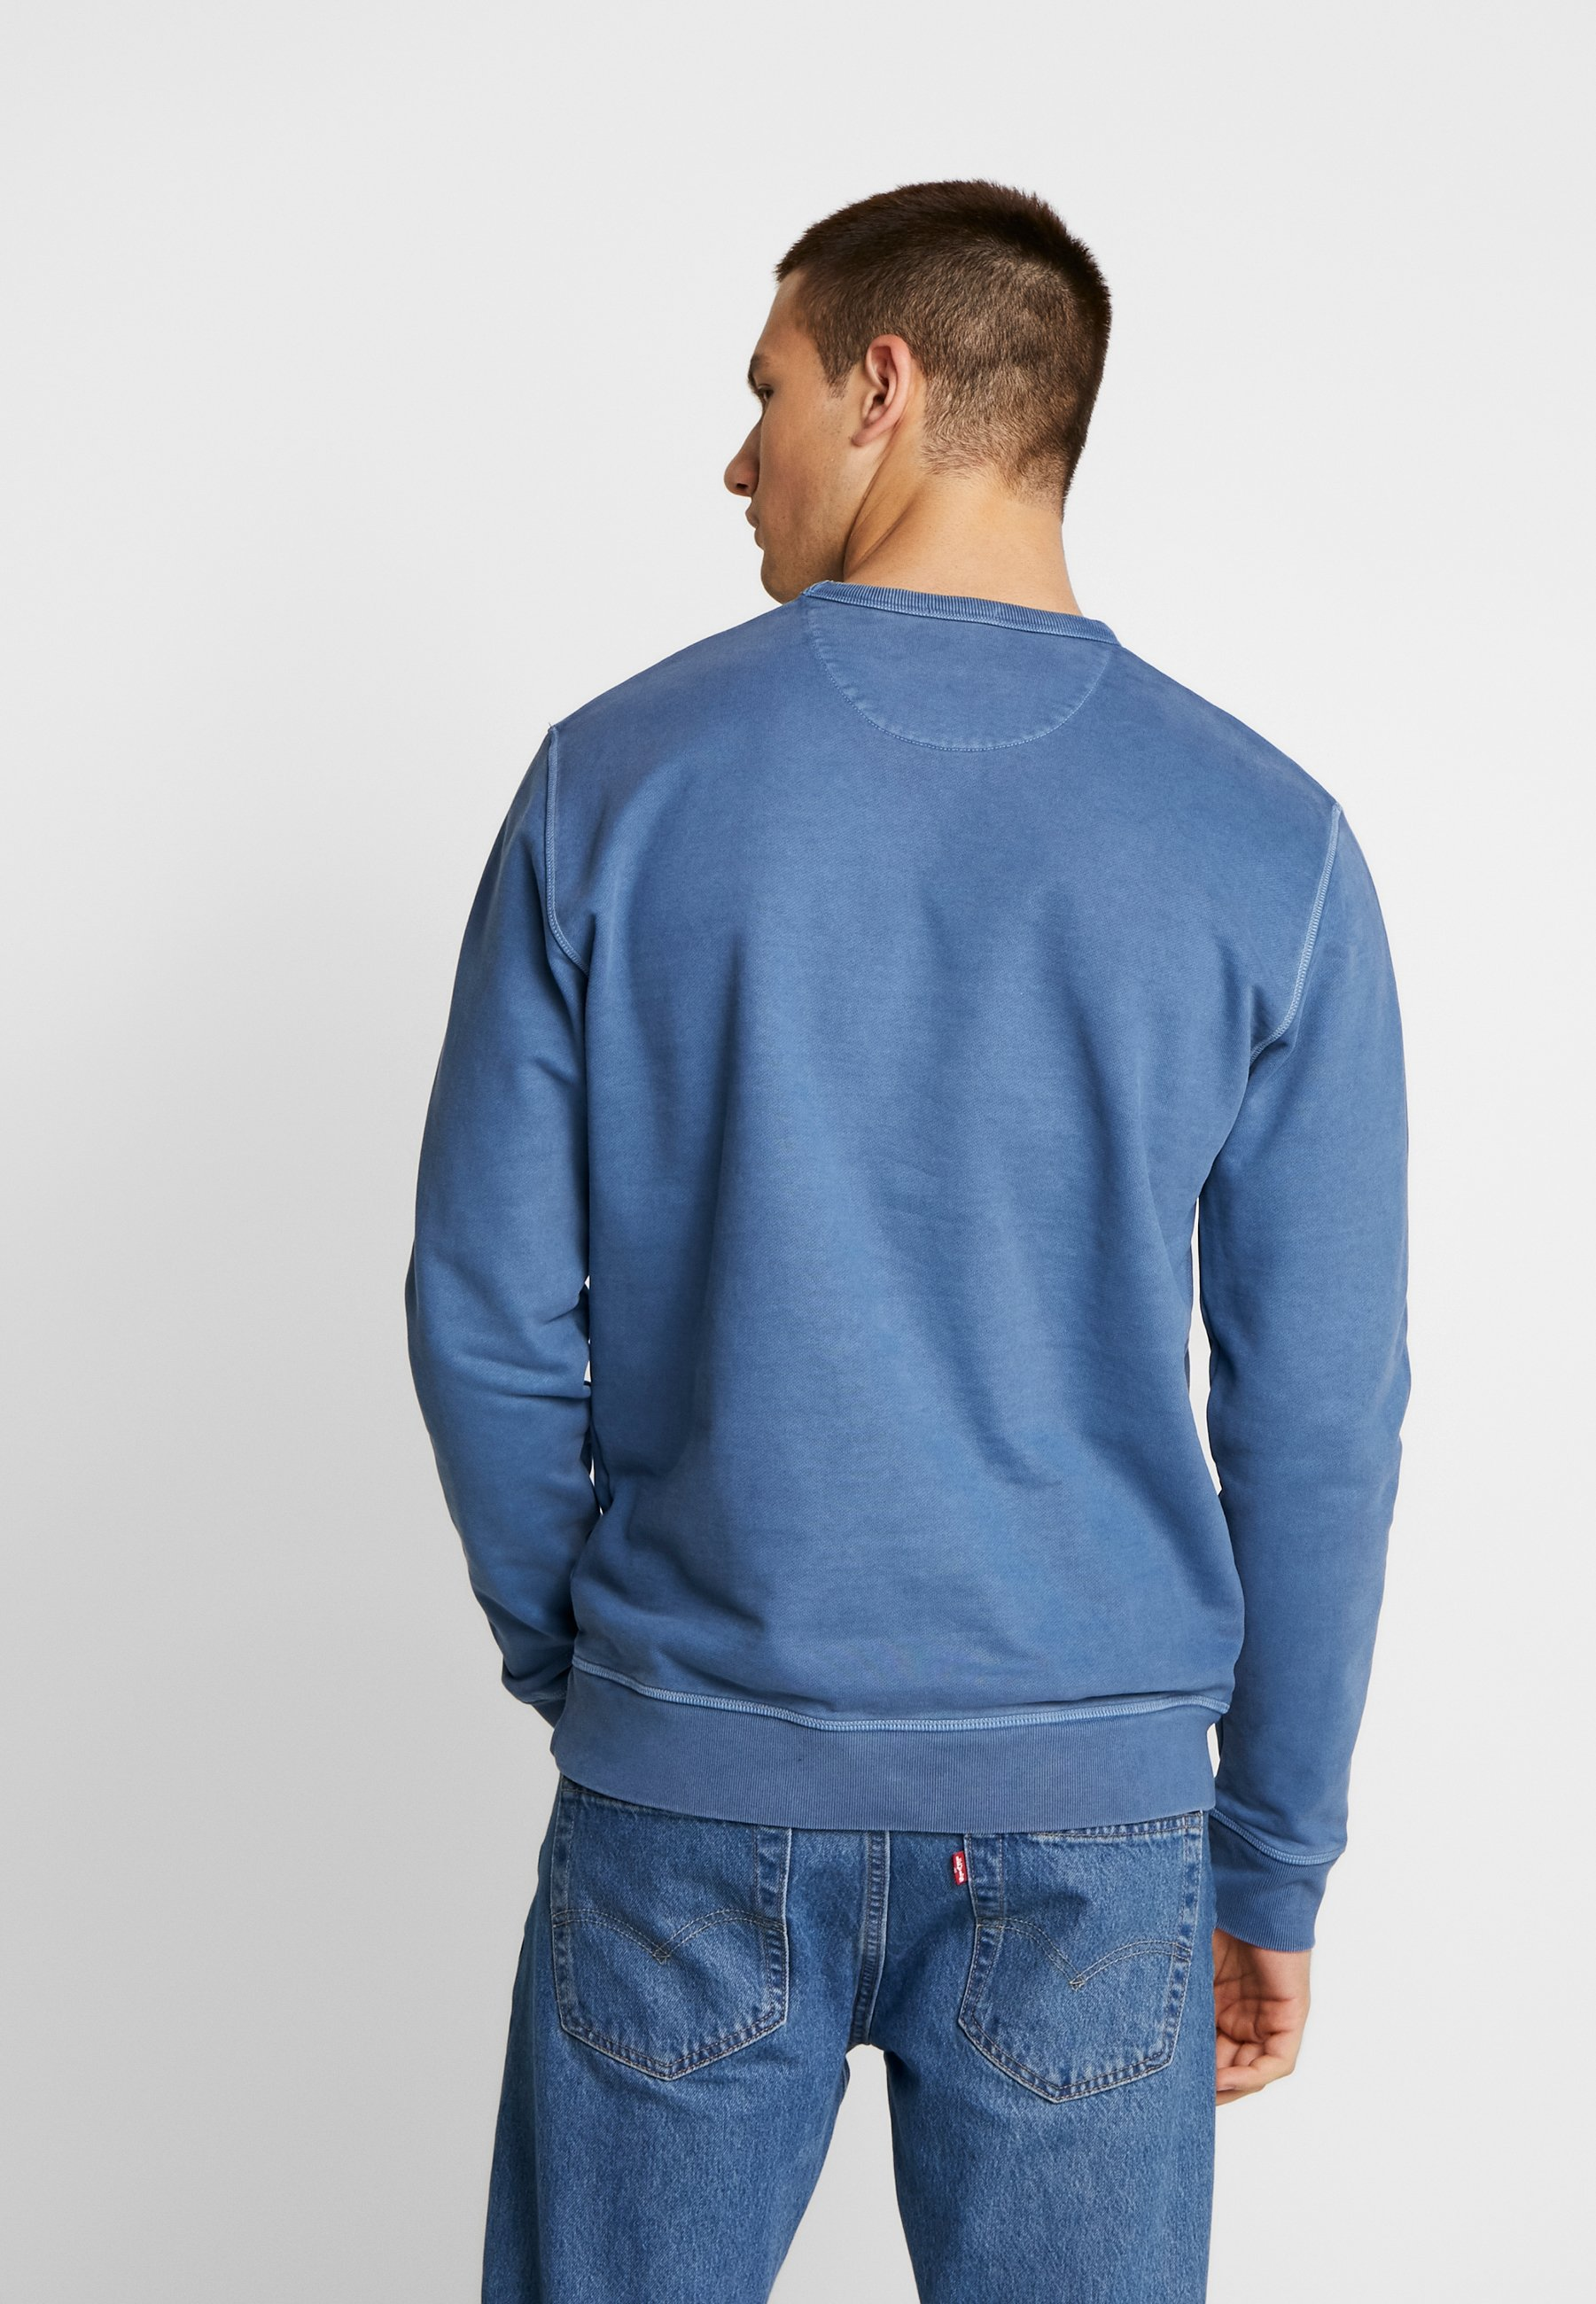 Pepe Jeans Avalon - Sweater Thames X9ZsoBrr pVHxkJpL